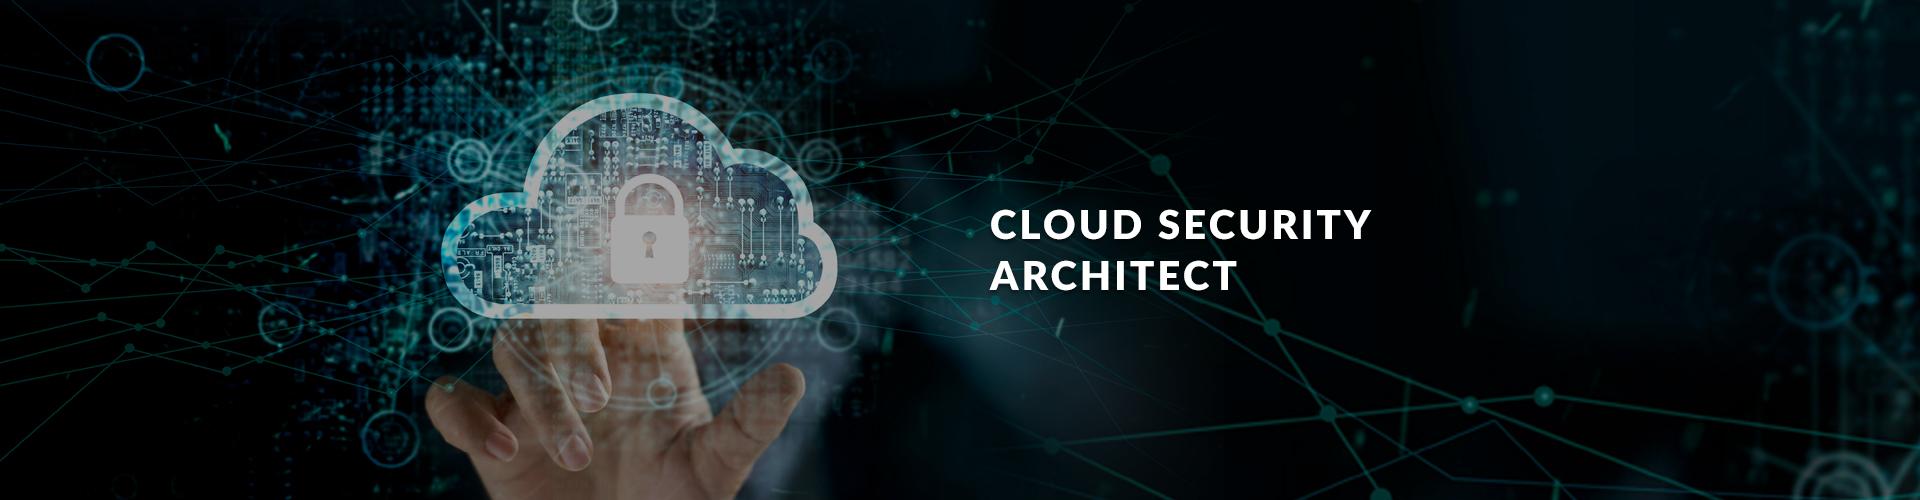 Cloud-Security-Architect